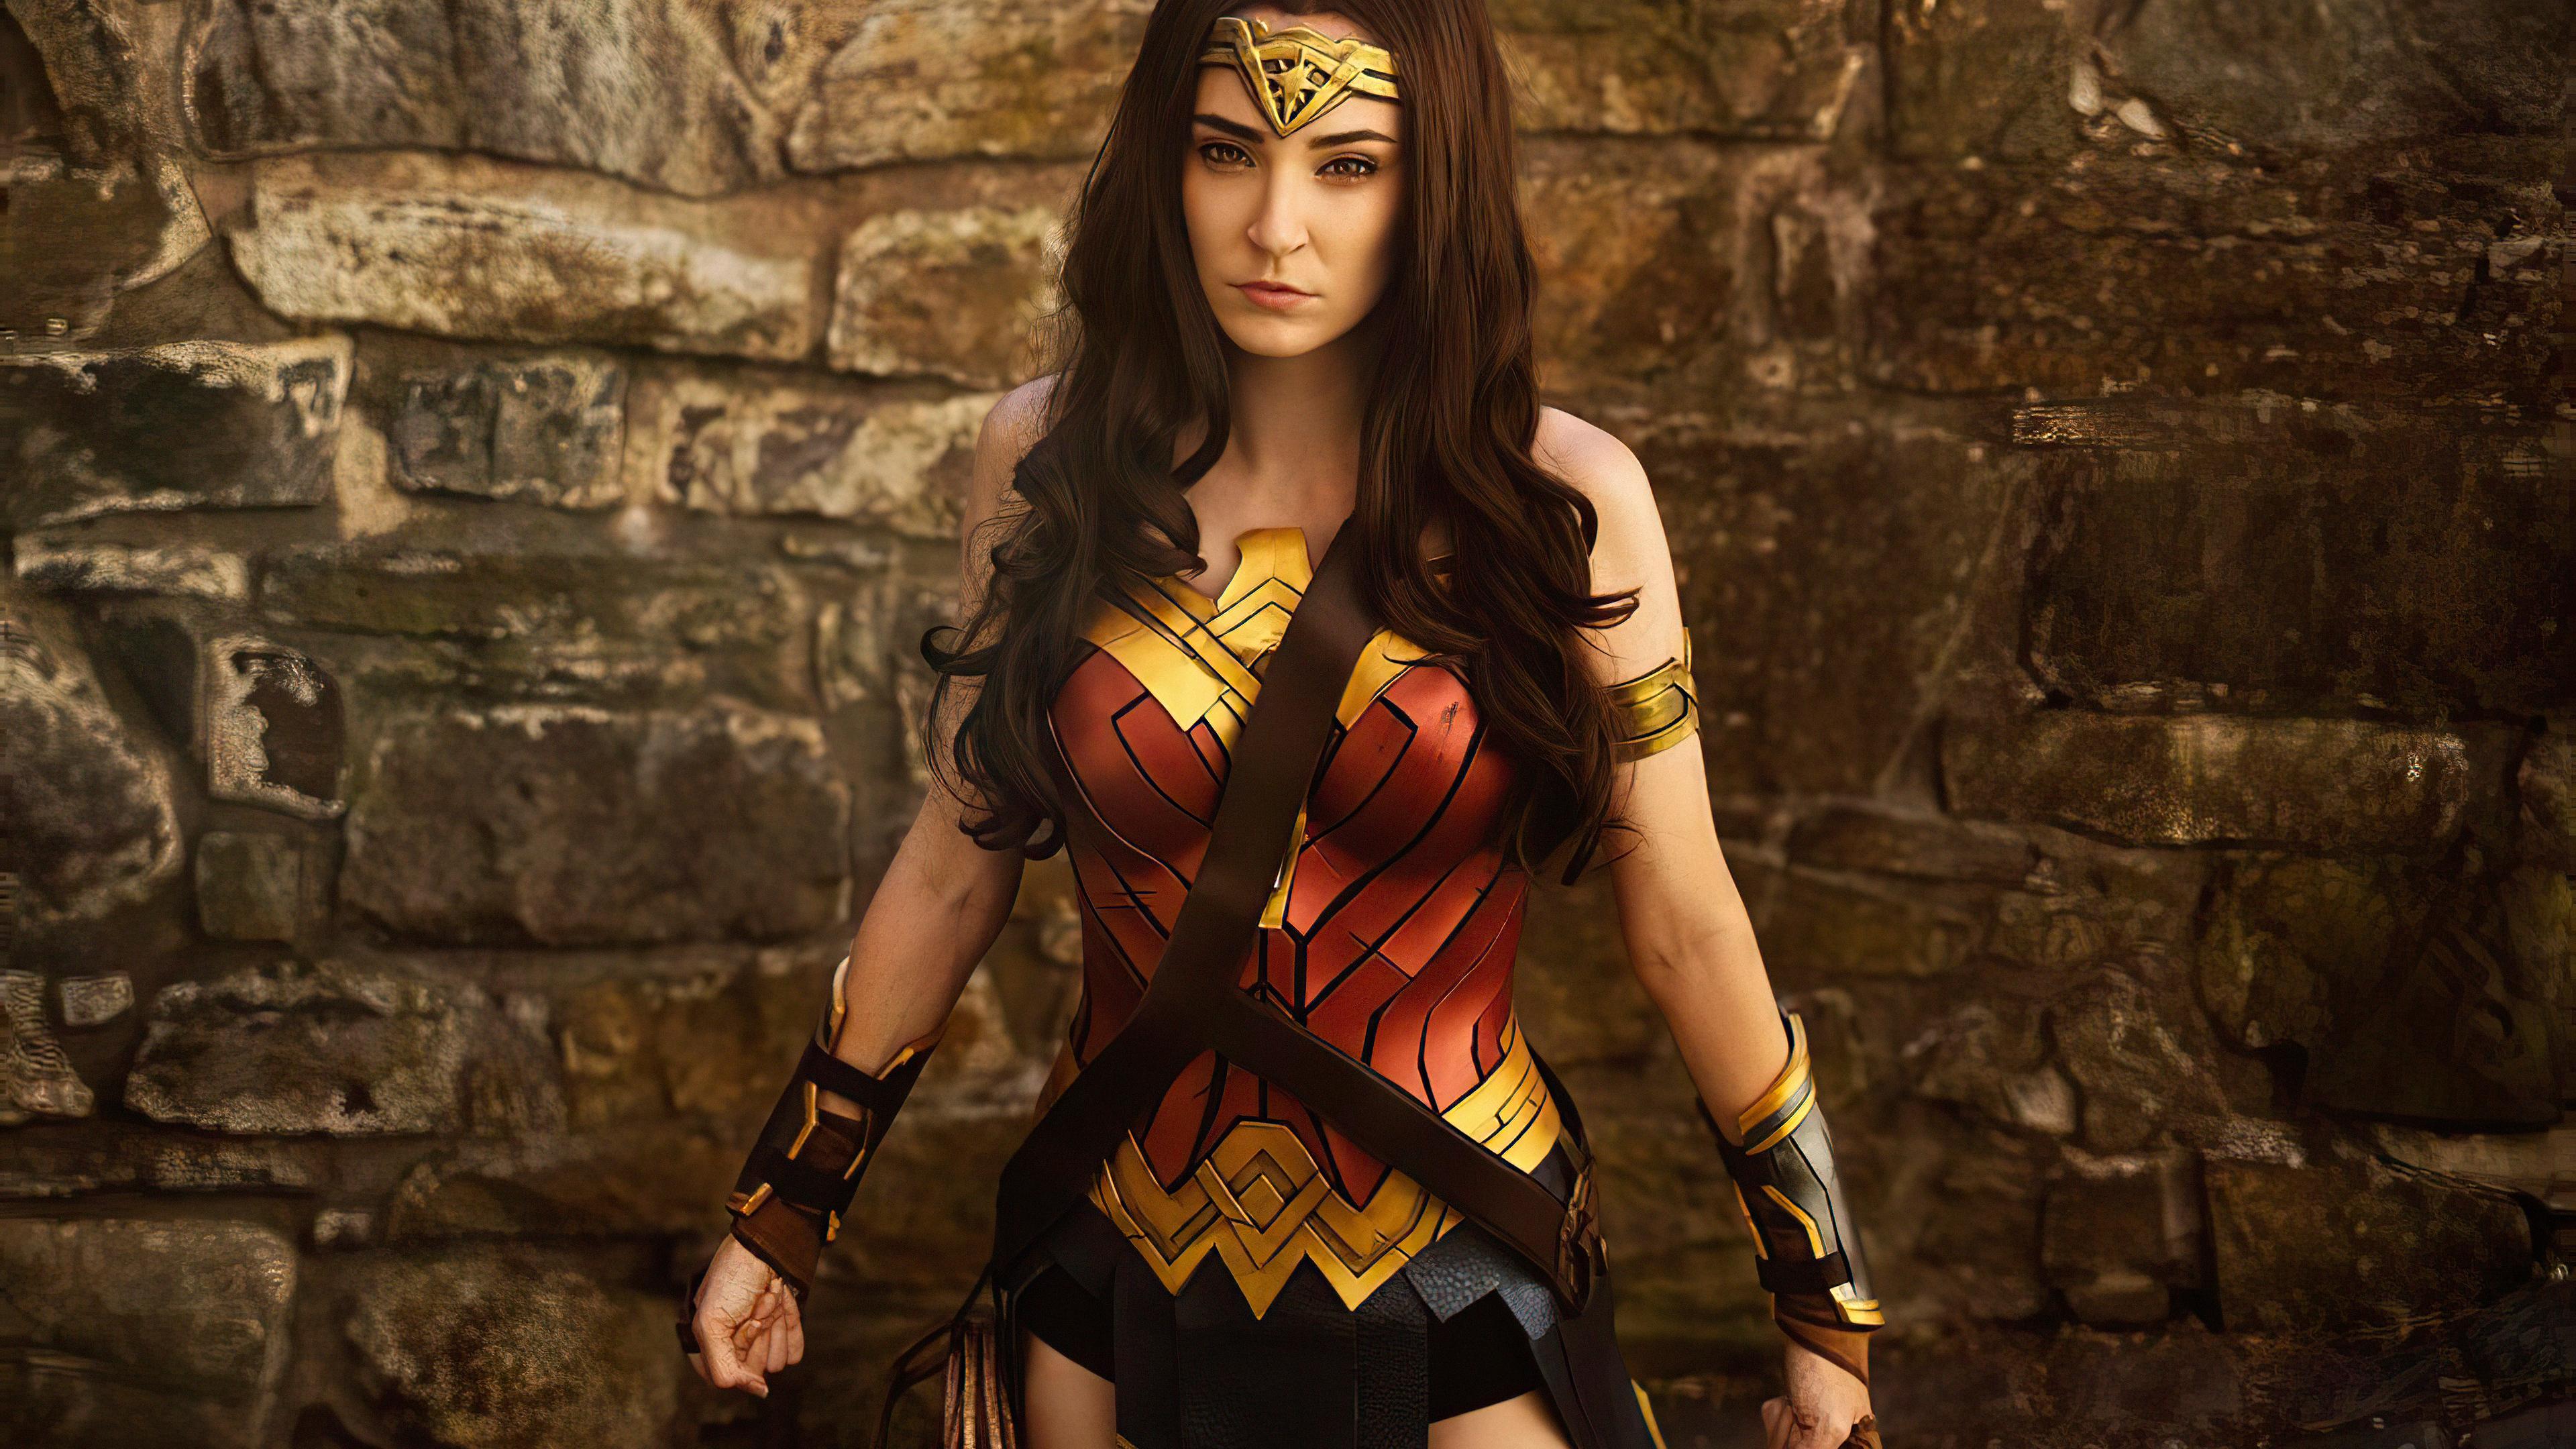 Wallpaper 4k Wonder Woman Cosplay 2019 4k Wallpapers